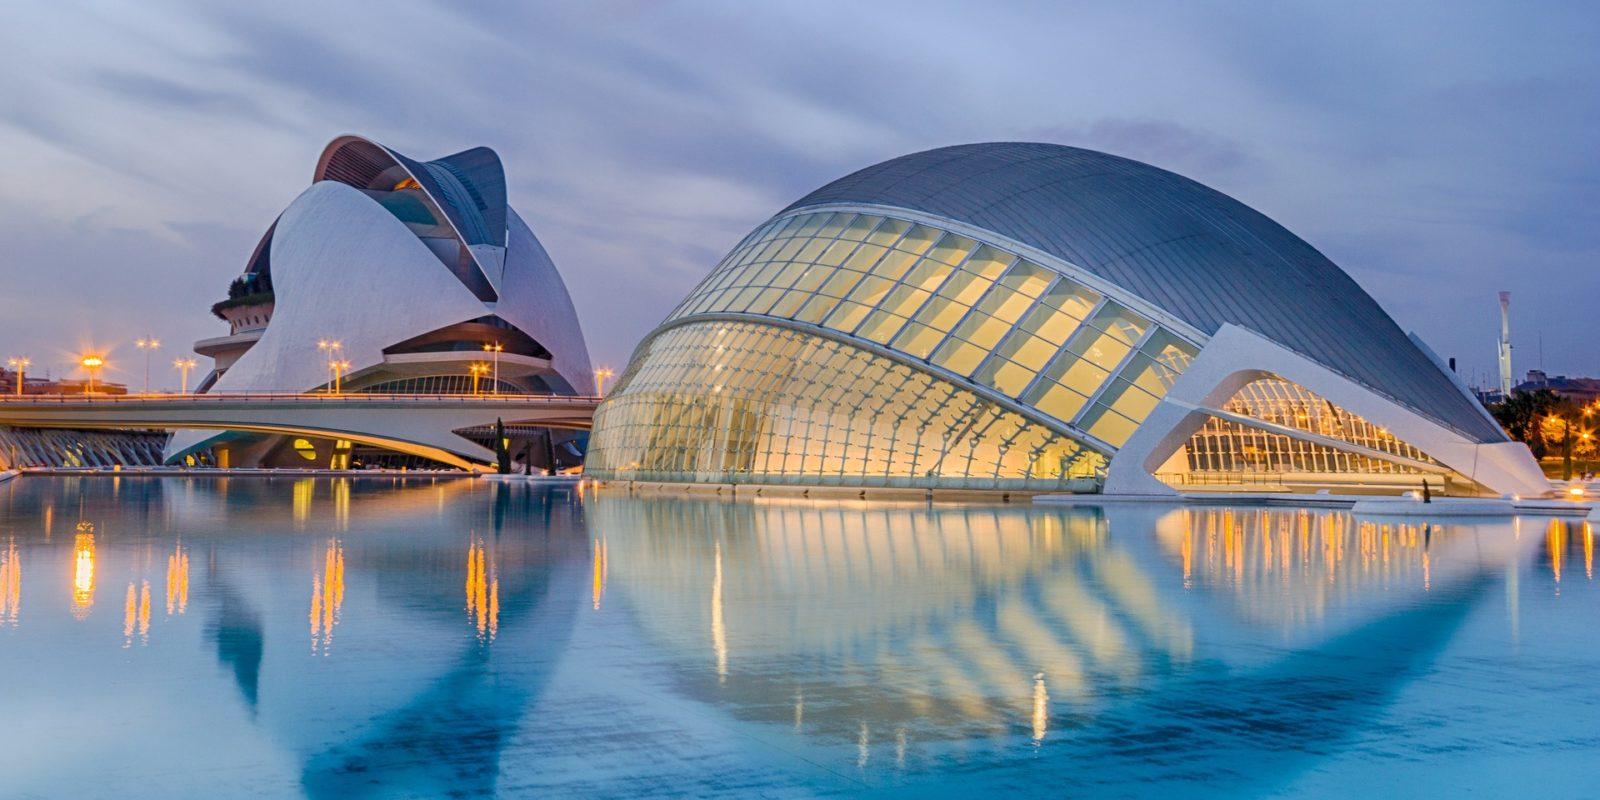 Santiago Calatrava Structures Hemisfèric Movie Theatre, Valencia, SPAIN